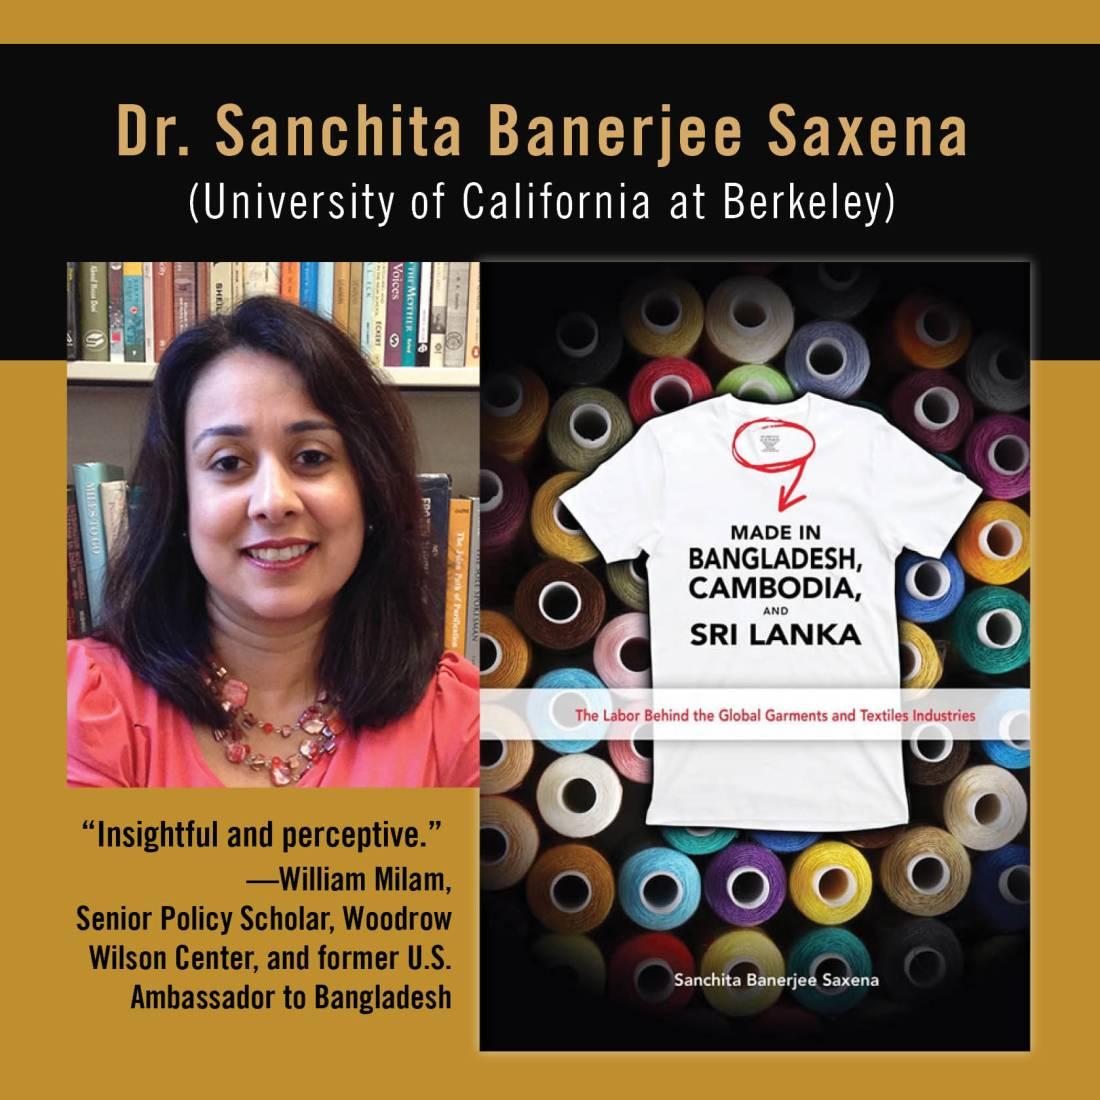 Sanchita Banerjee Saxena